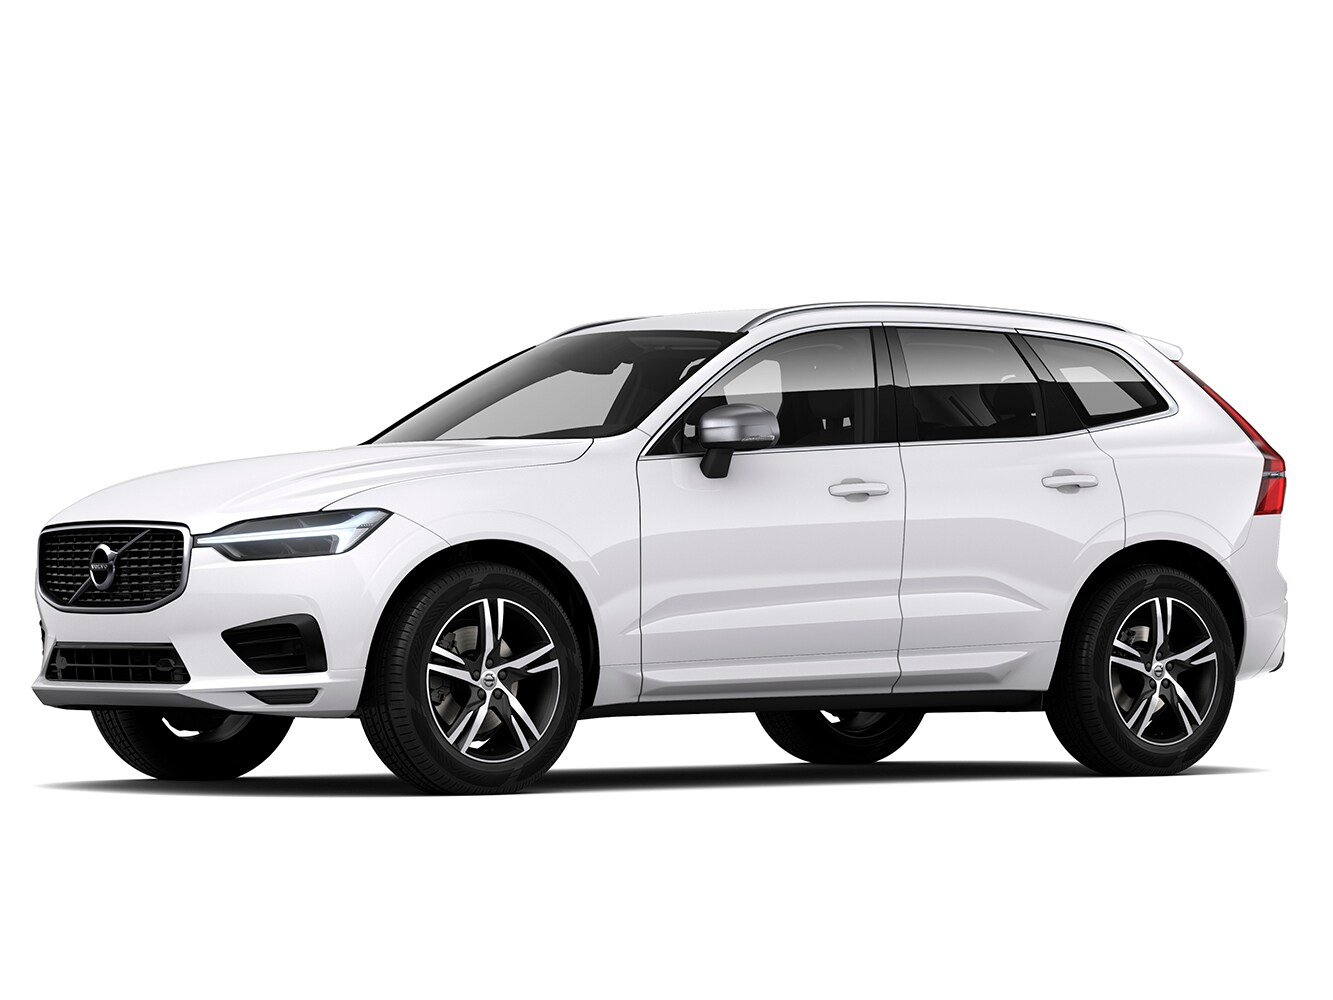 New Volvo Suv >> XC60 | Volvo Cars